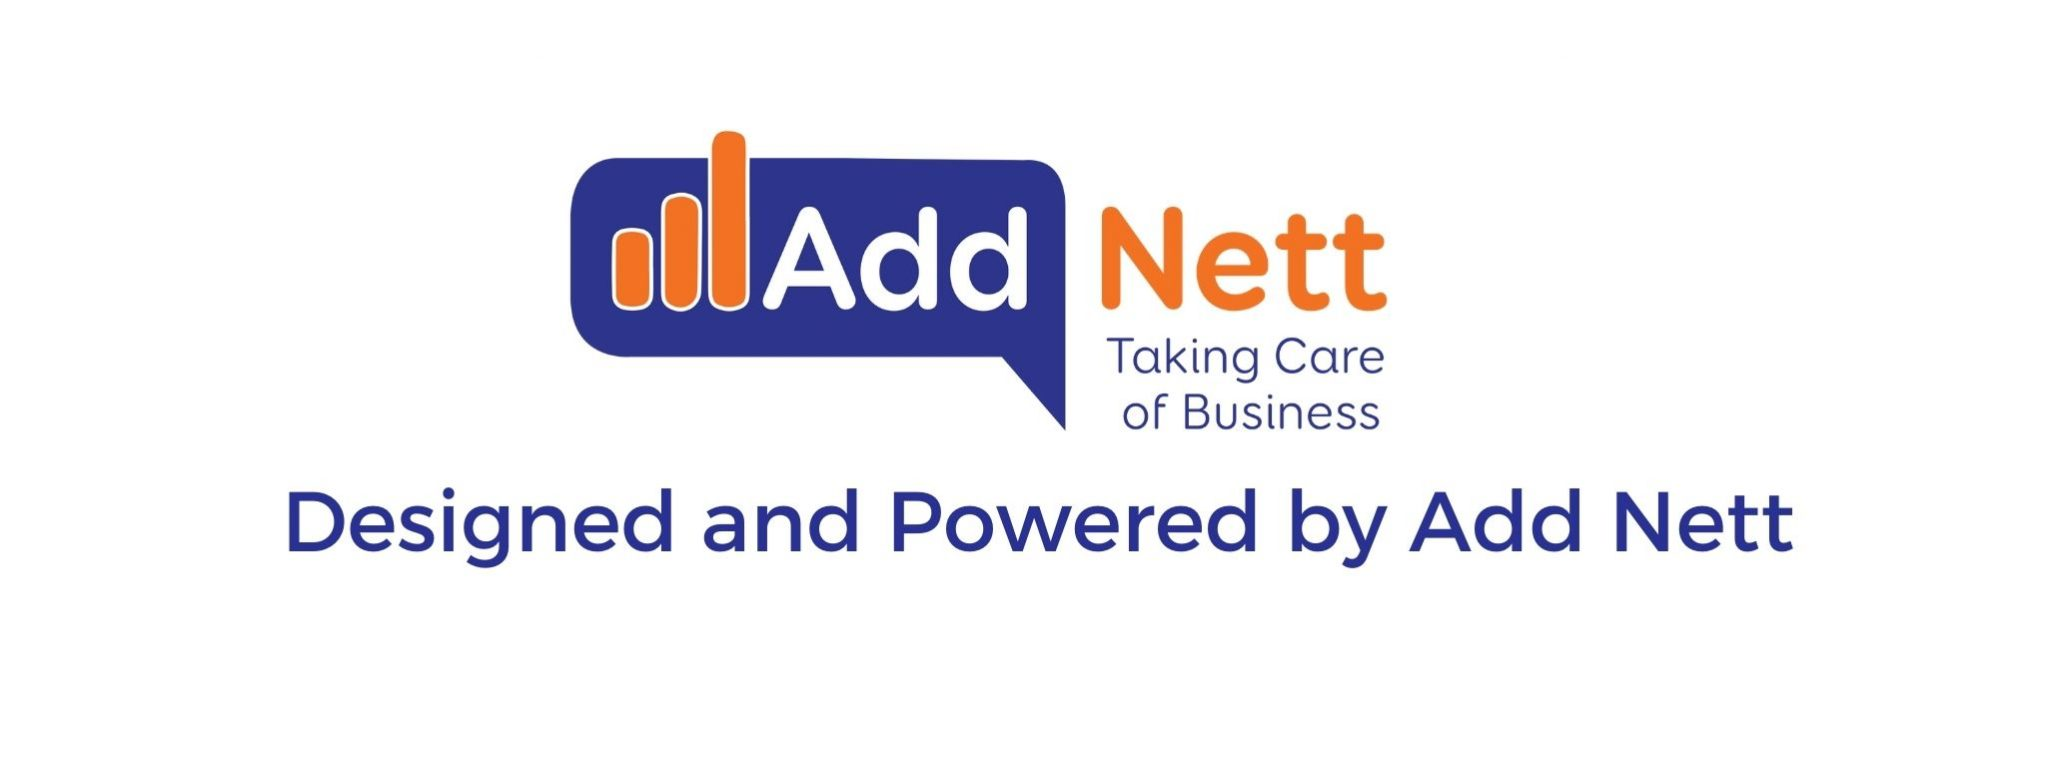 blue and orange built with Addnett logo